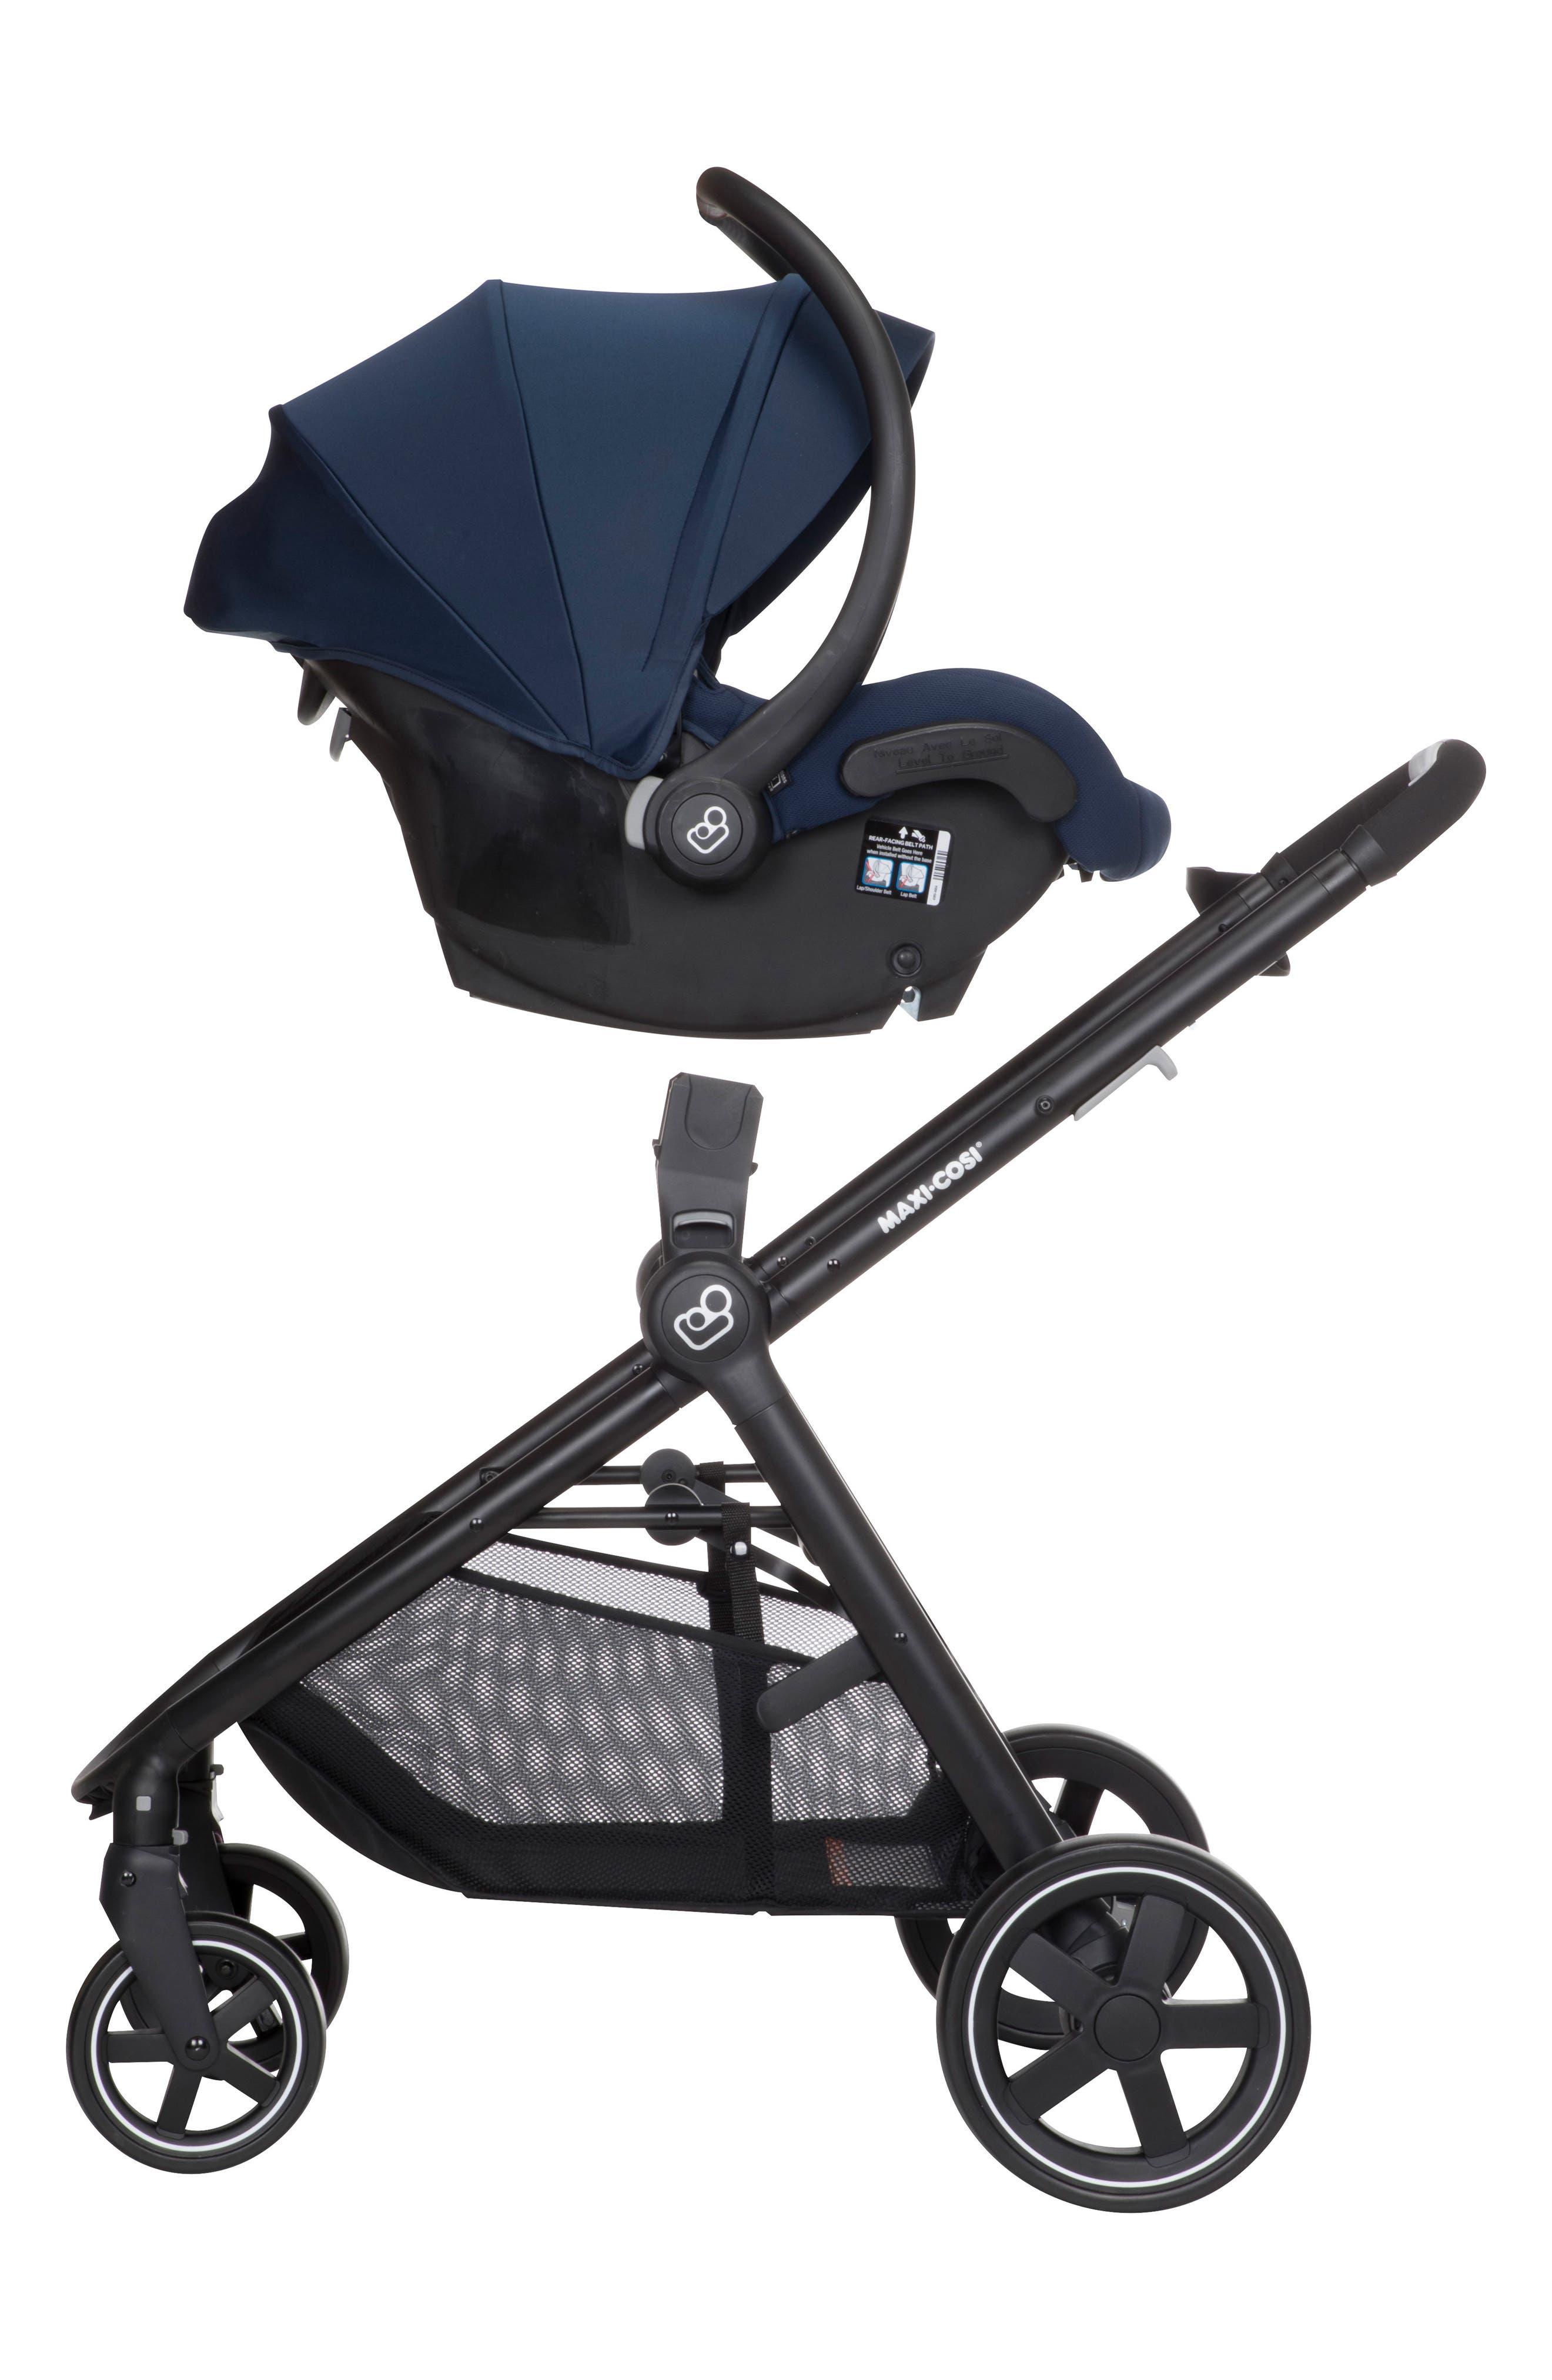 5-1 Mico 30 Infant Car Seat & Zelia Stroller Modular Travel System,                             Alternate thumbnail 14, color,                             EMERALD TIDE